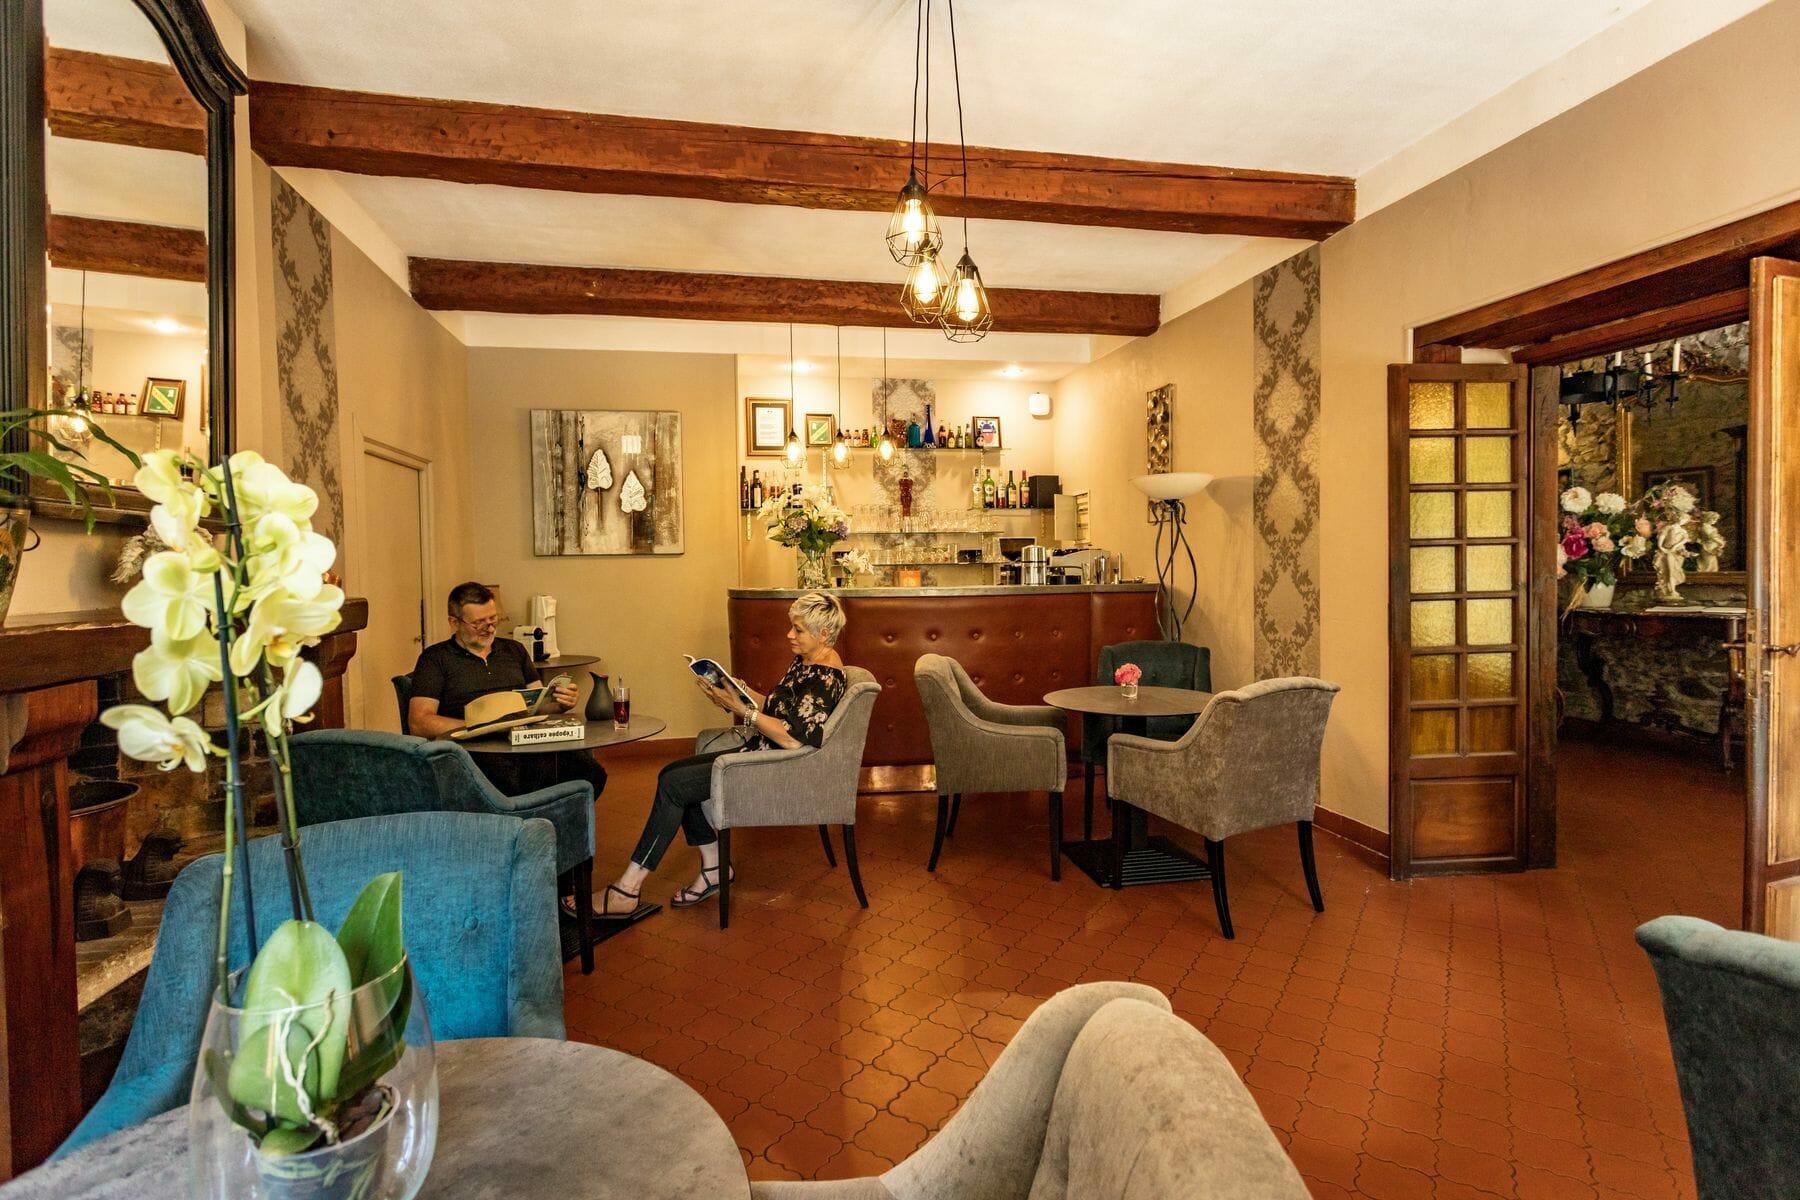 hostellerie du grand duc - Gincla